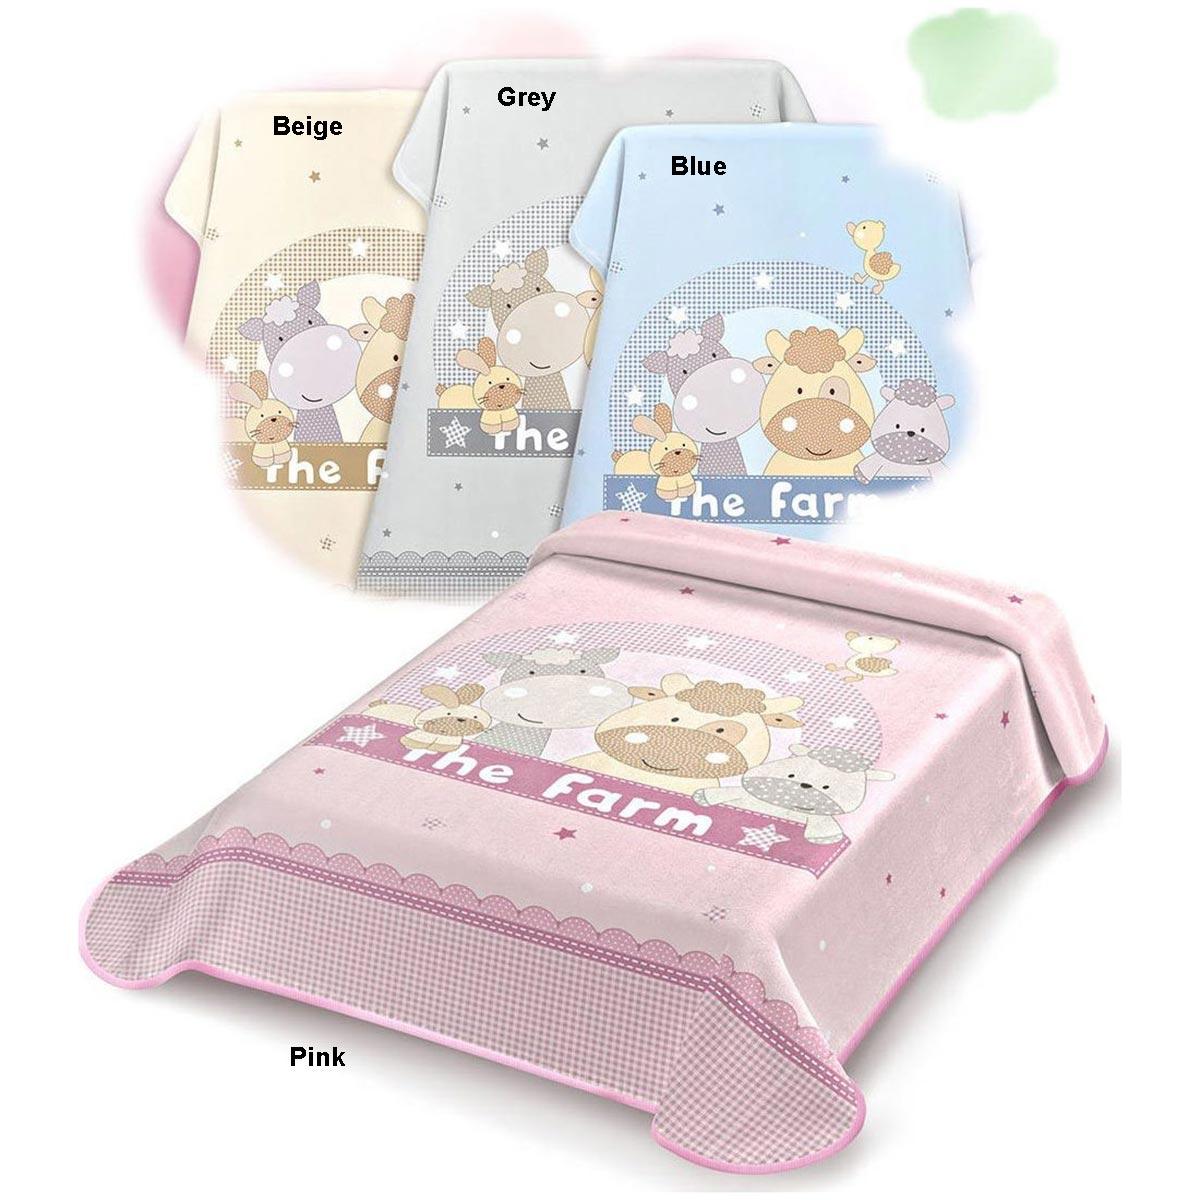 Bunny bebe βρεφική κουβέρτα βελουτέ αγκαλιάς 80×110 Belpla Ster 664